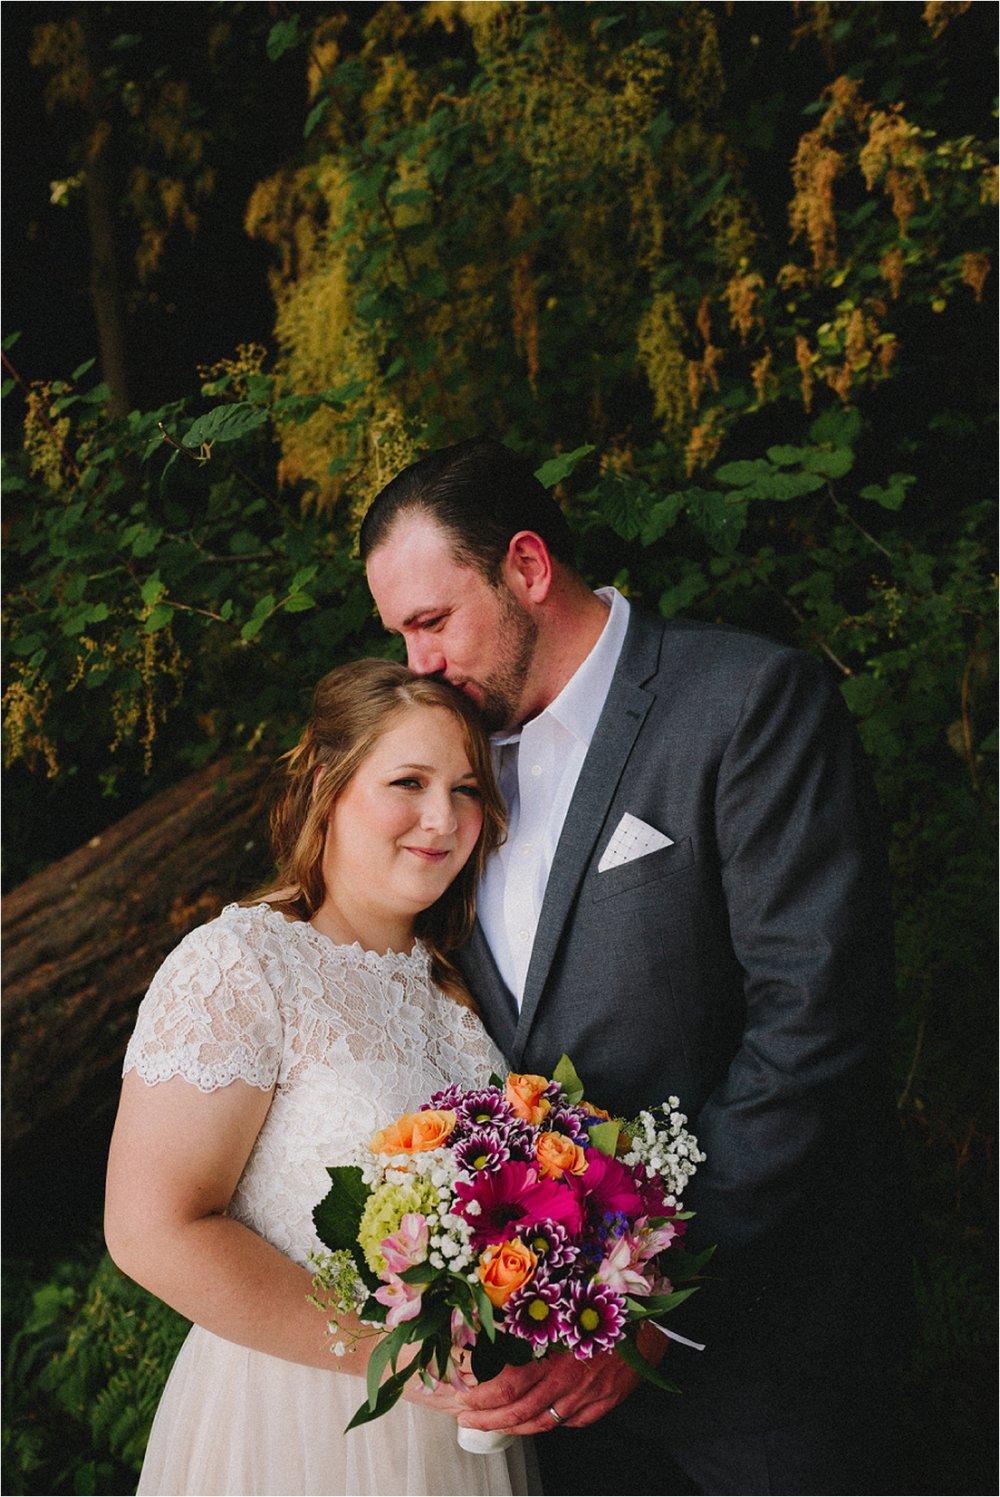 owen-beach-priest-point-park-tacoma-washington-elopement-jannicka-mayte-anchorage-alaska-wedding-elopement-photographer (24).jpg